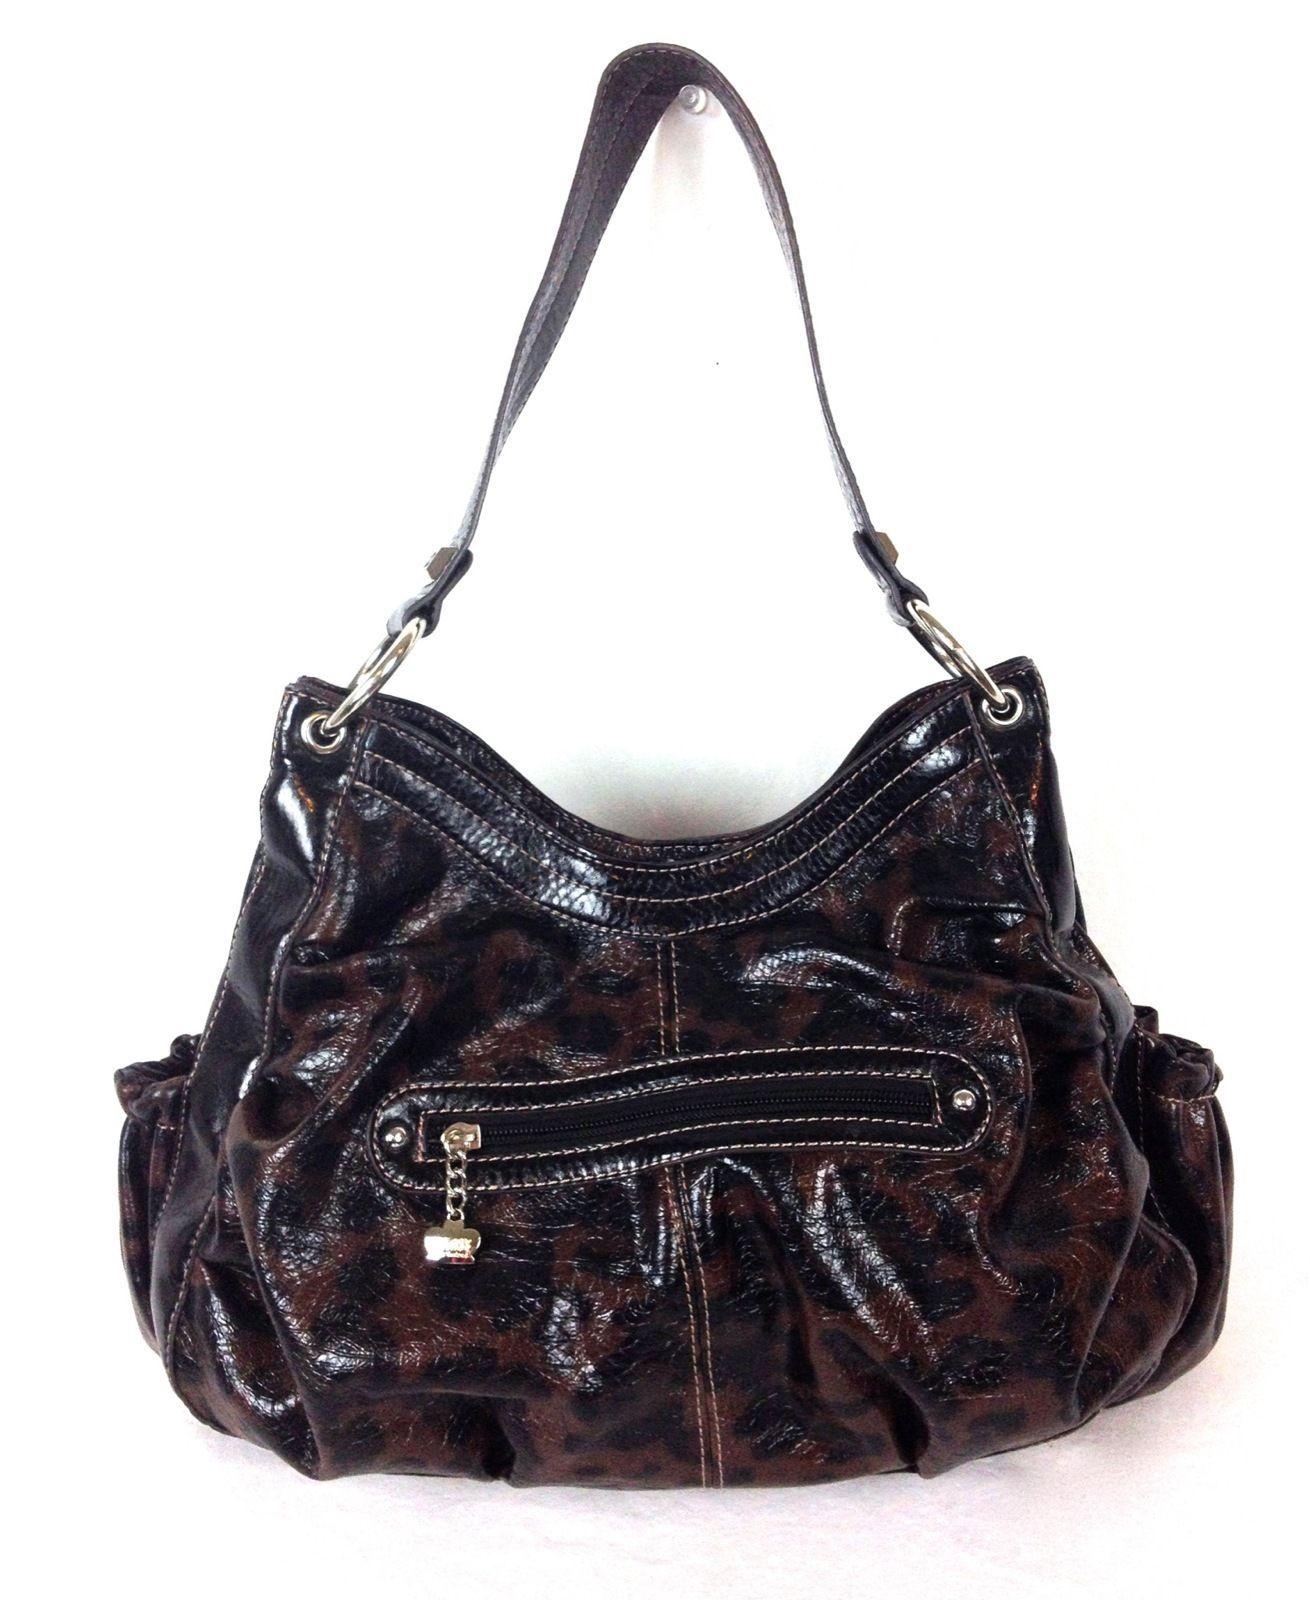 05e70119f Kathy Van Zeeland Purse Brown Handbag Hobo Womens For Sale - Item #1474170